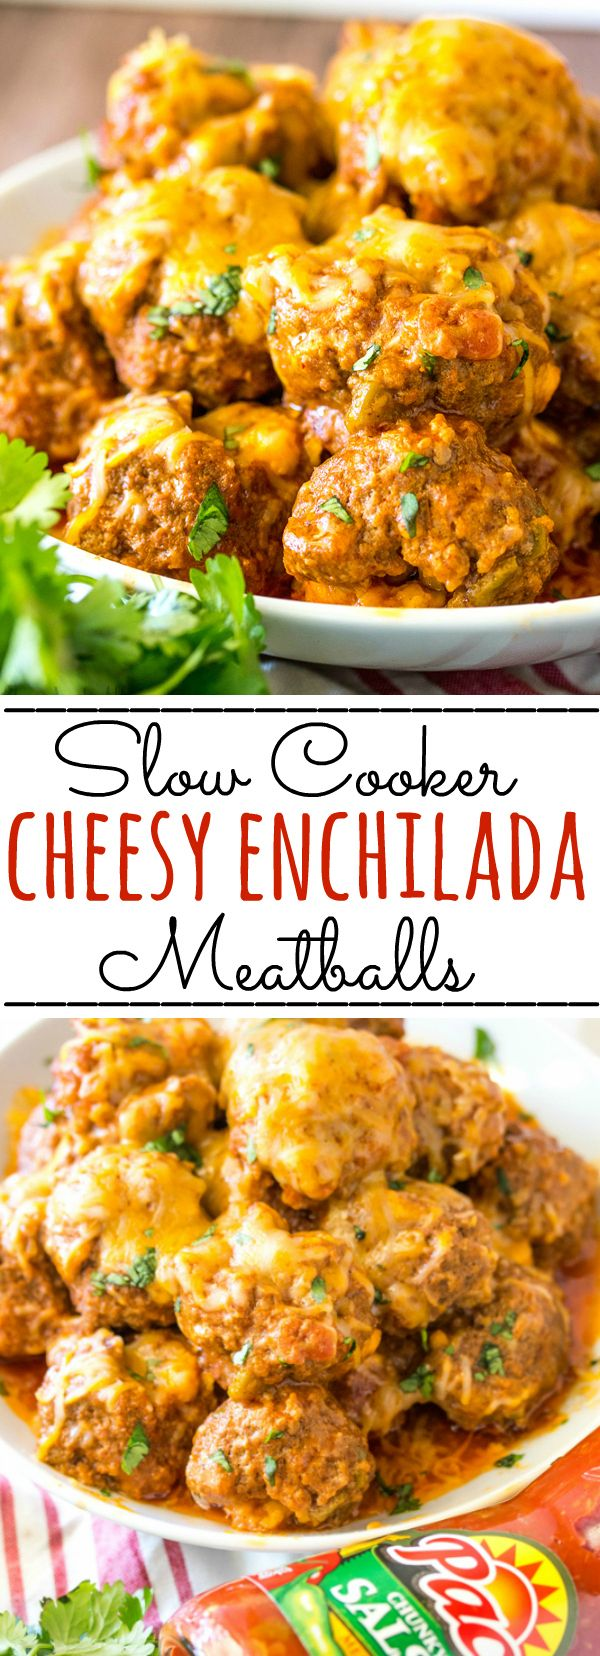 Slow Cooker Cheesy Enchilada Meatballs